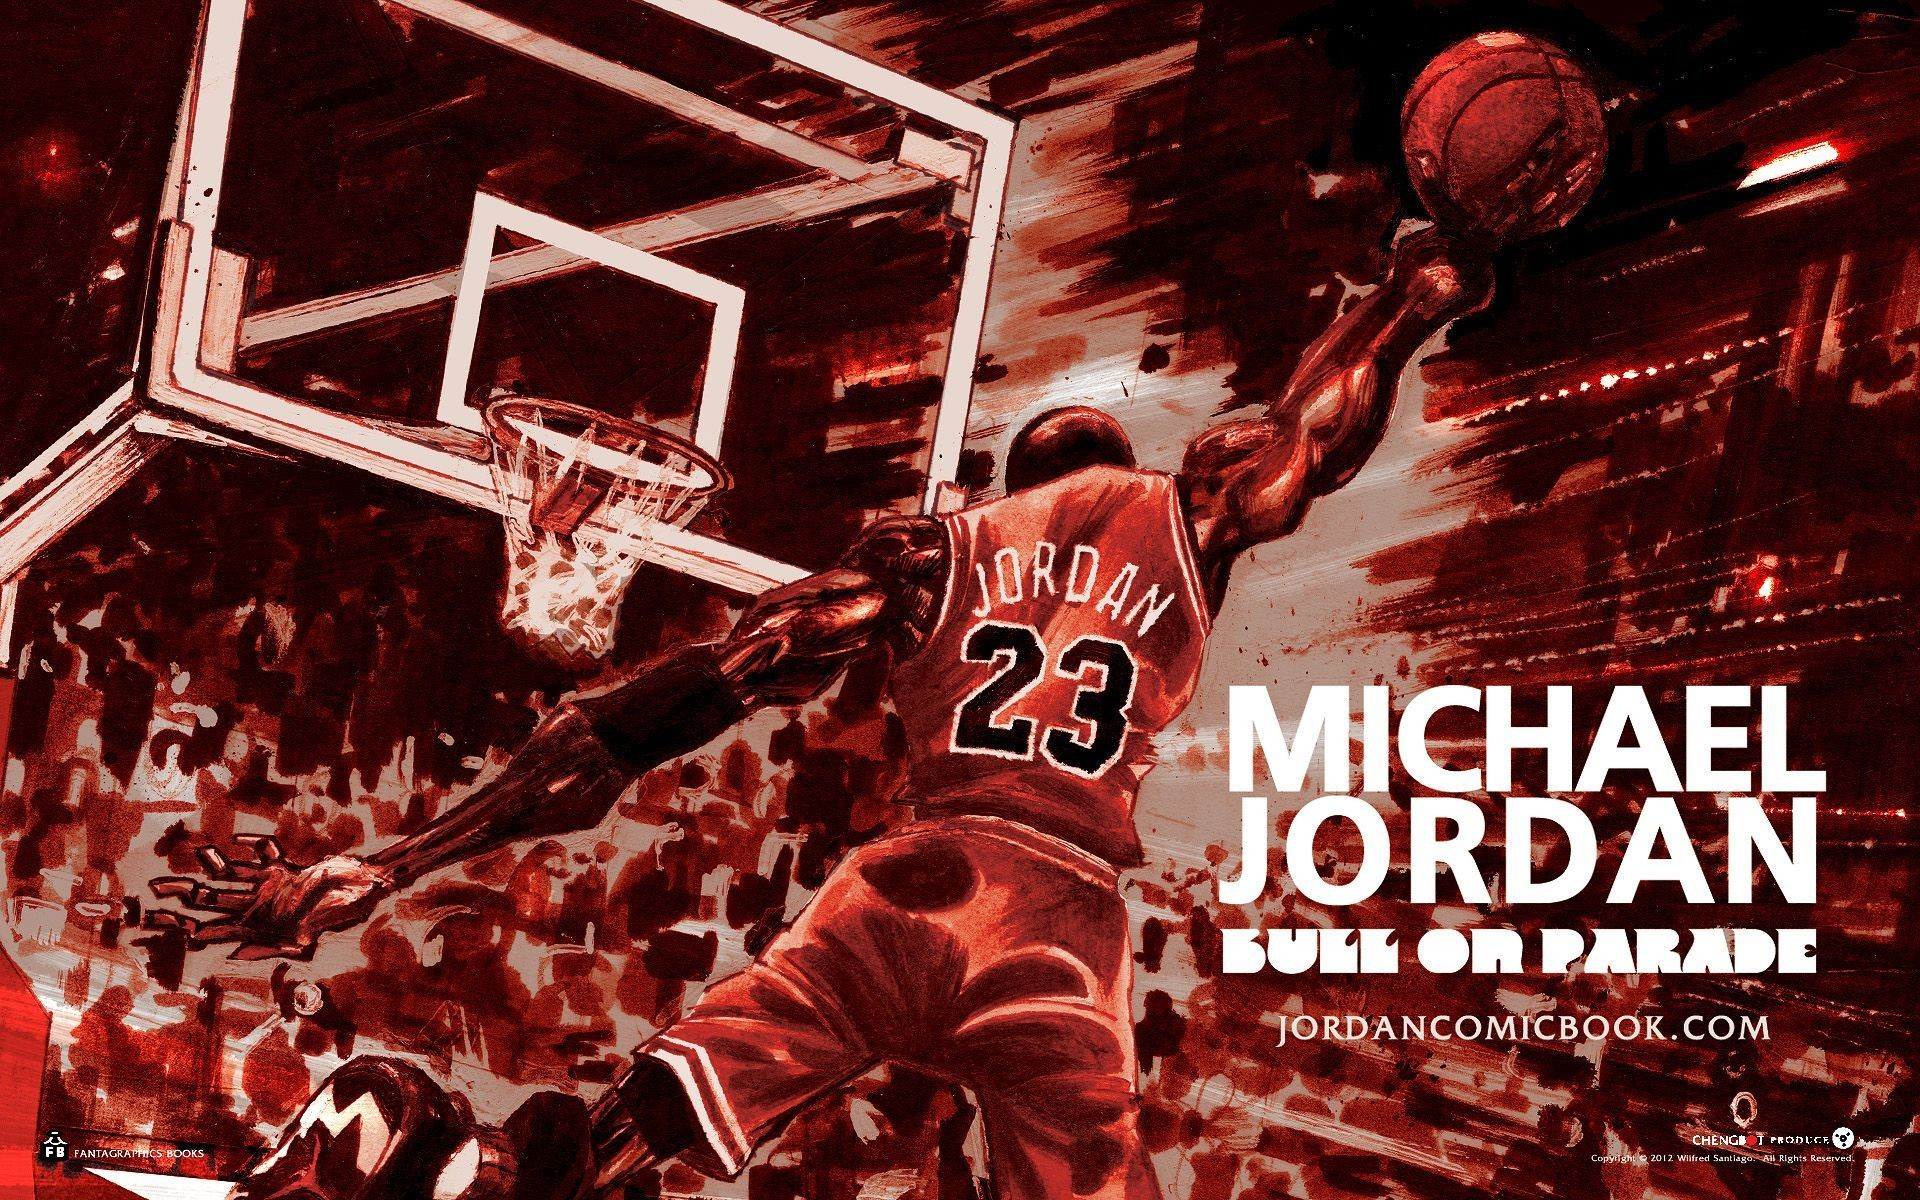 michael jordan wallpaper chicago bulls – Wallpaper